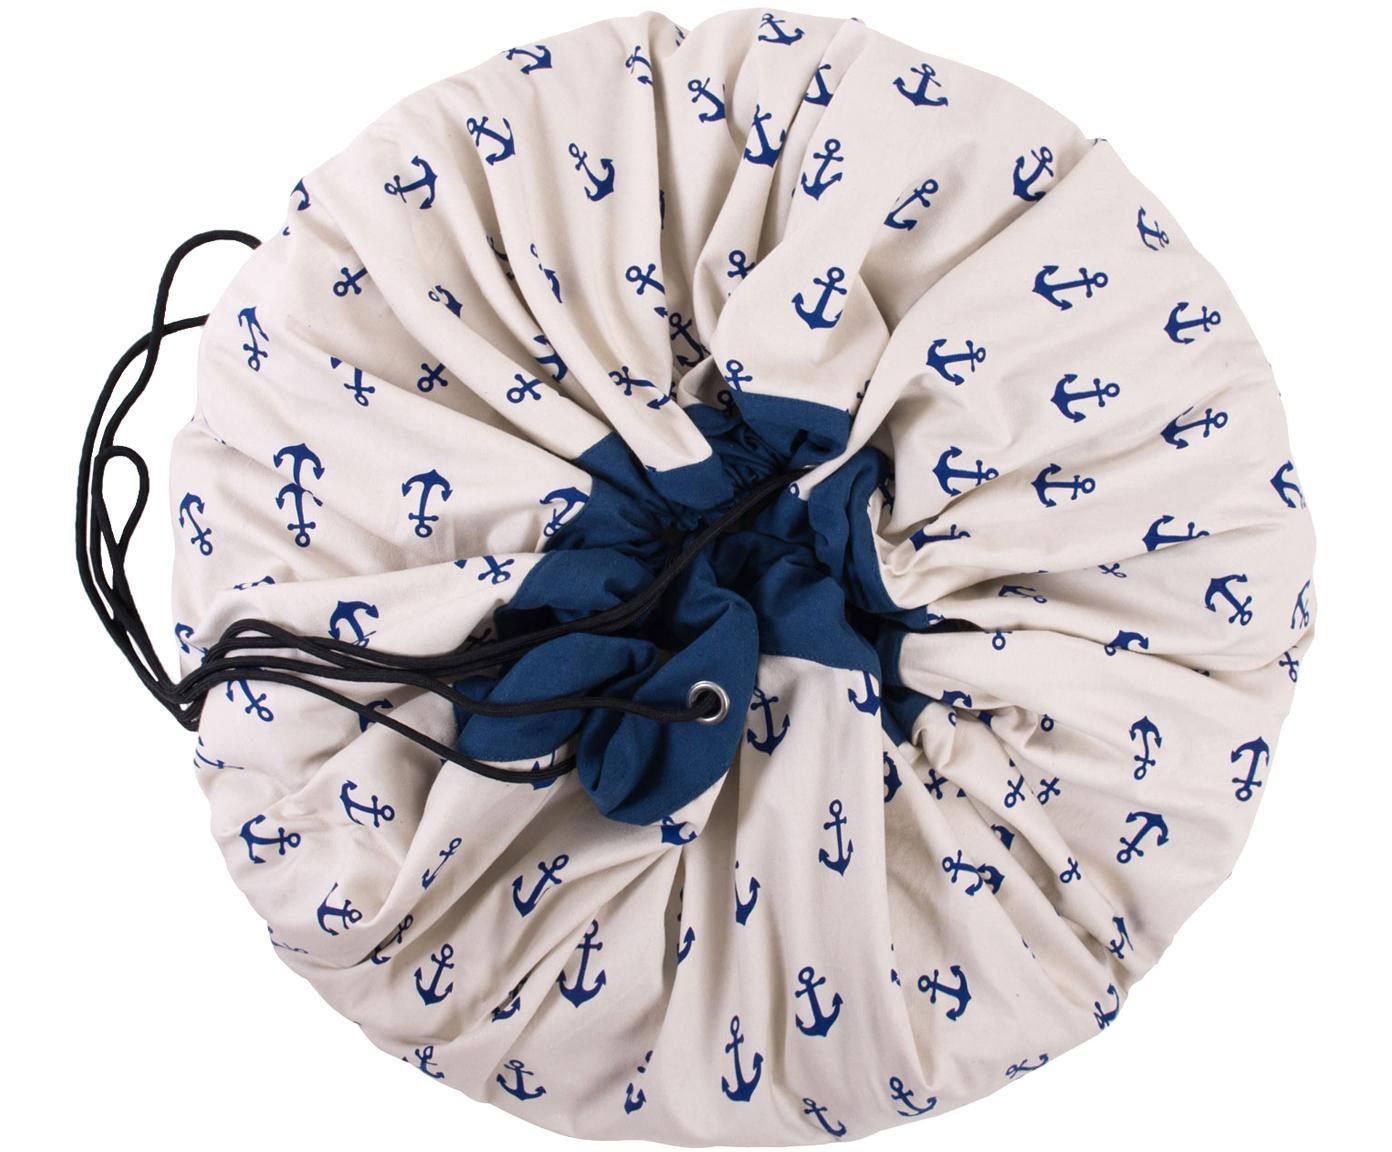 Sacco per giocattoli Anchors, Poliestere, Bianco, blu, Ø 140 cm